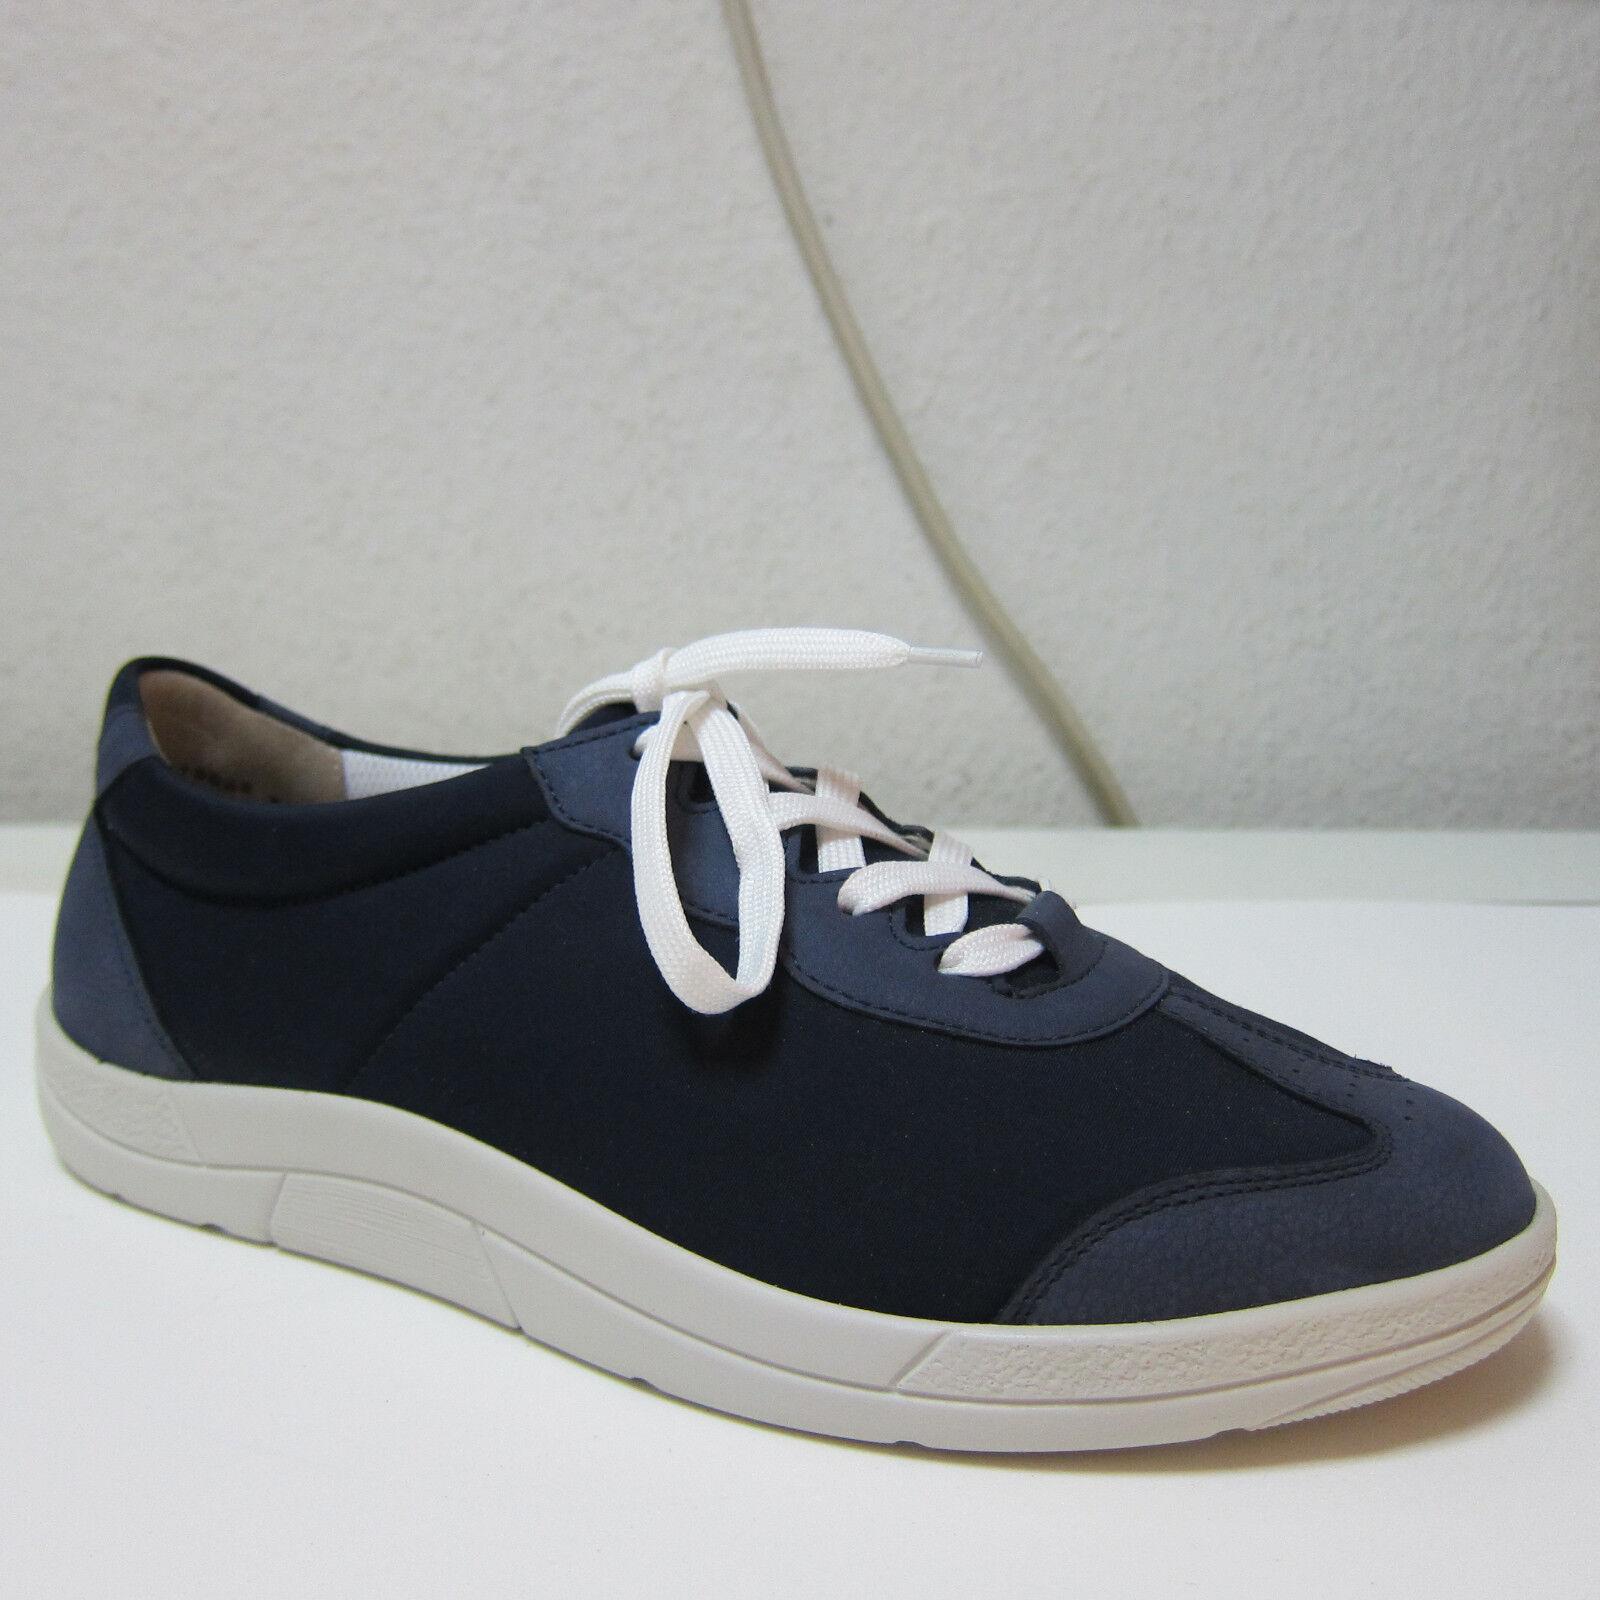 Berkemann señora semi zapato loses plantilla talla 7,0 (41)  1921